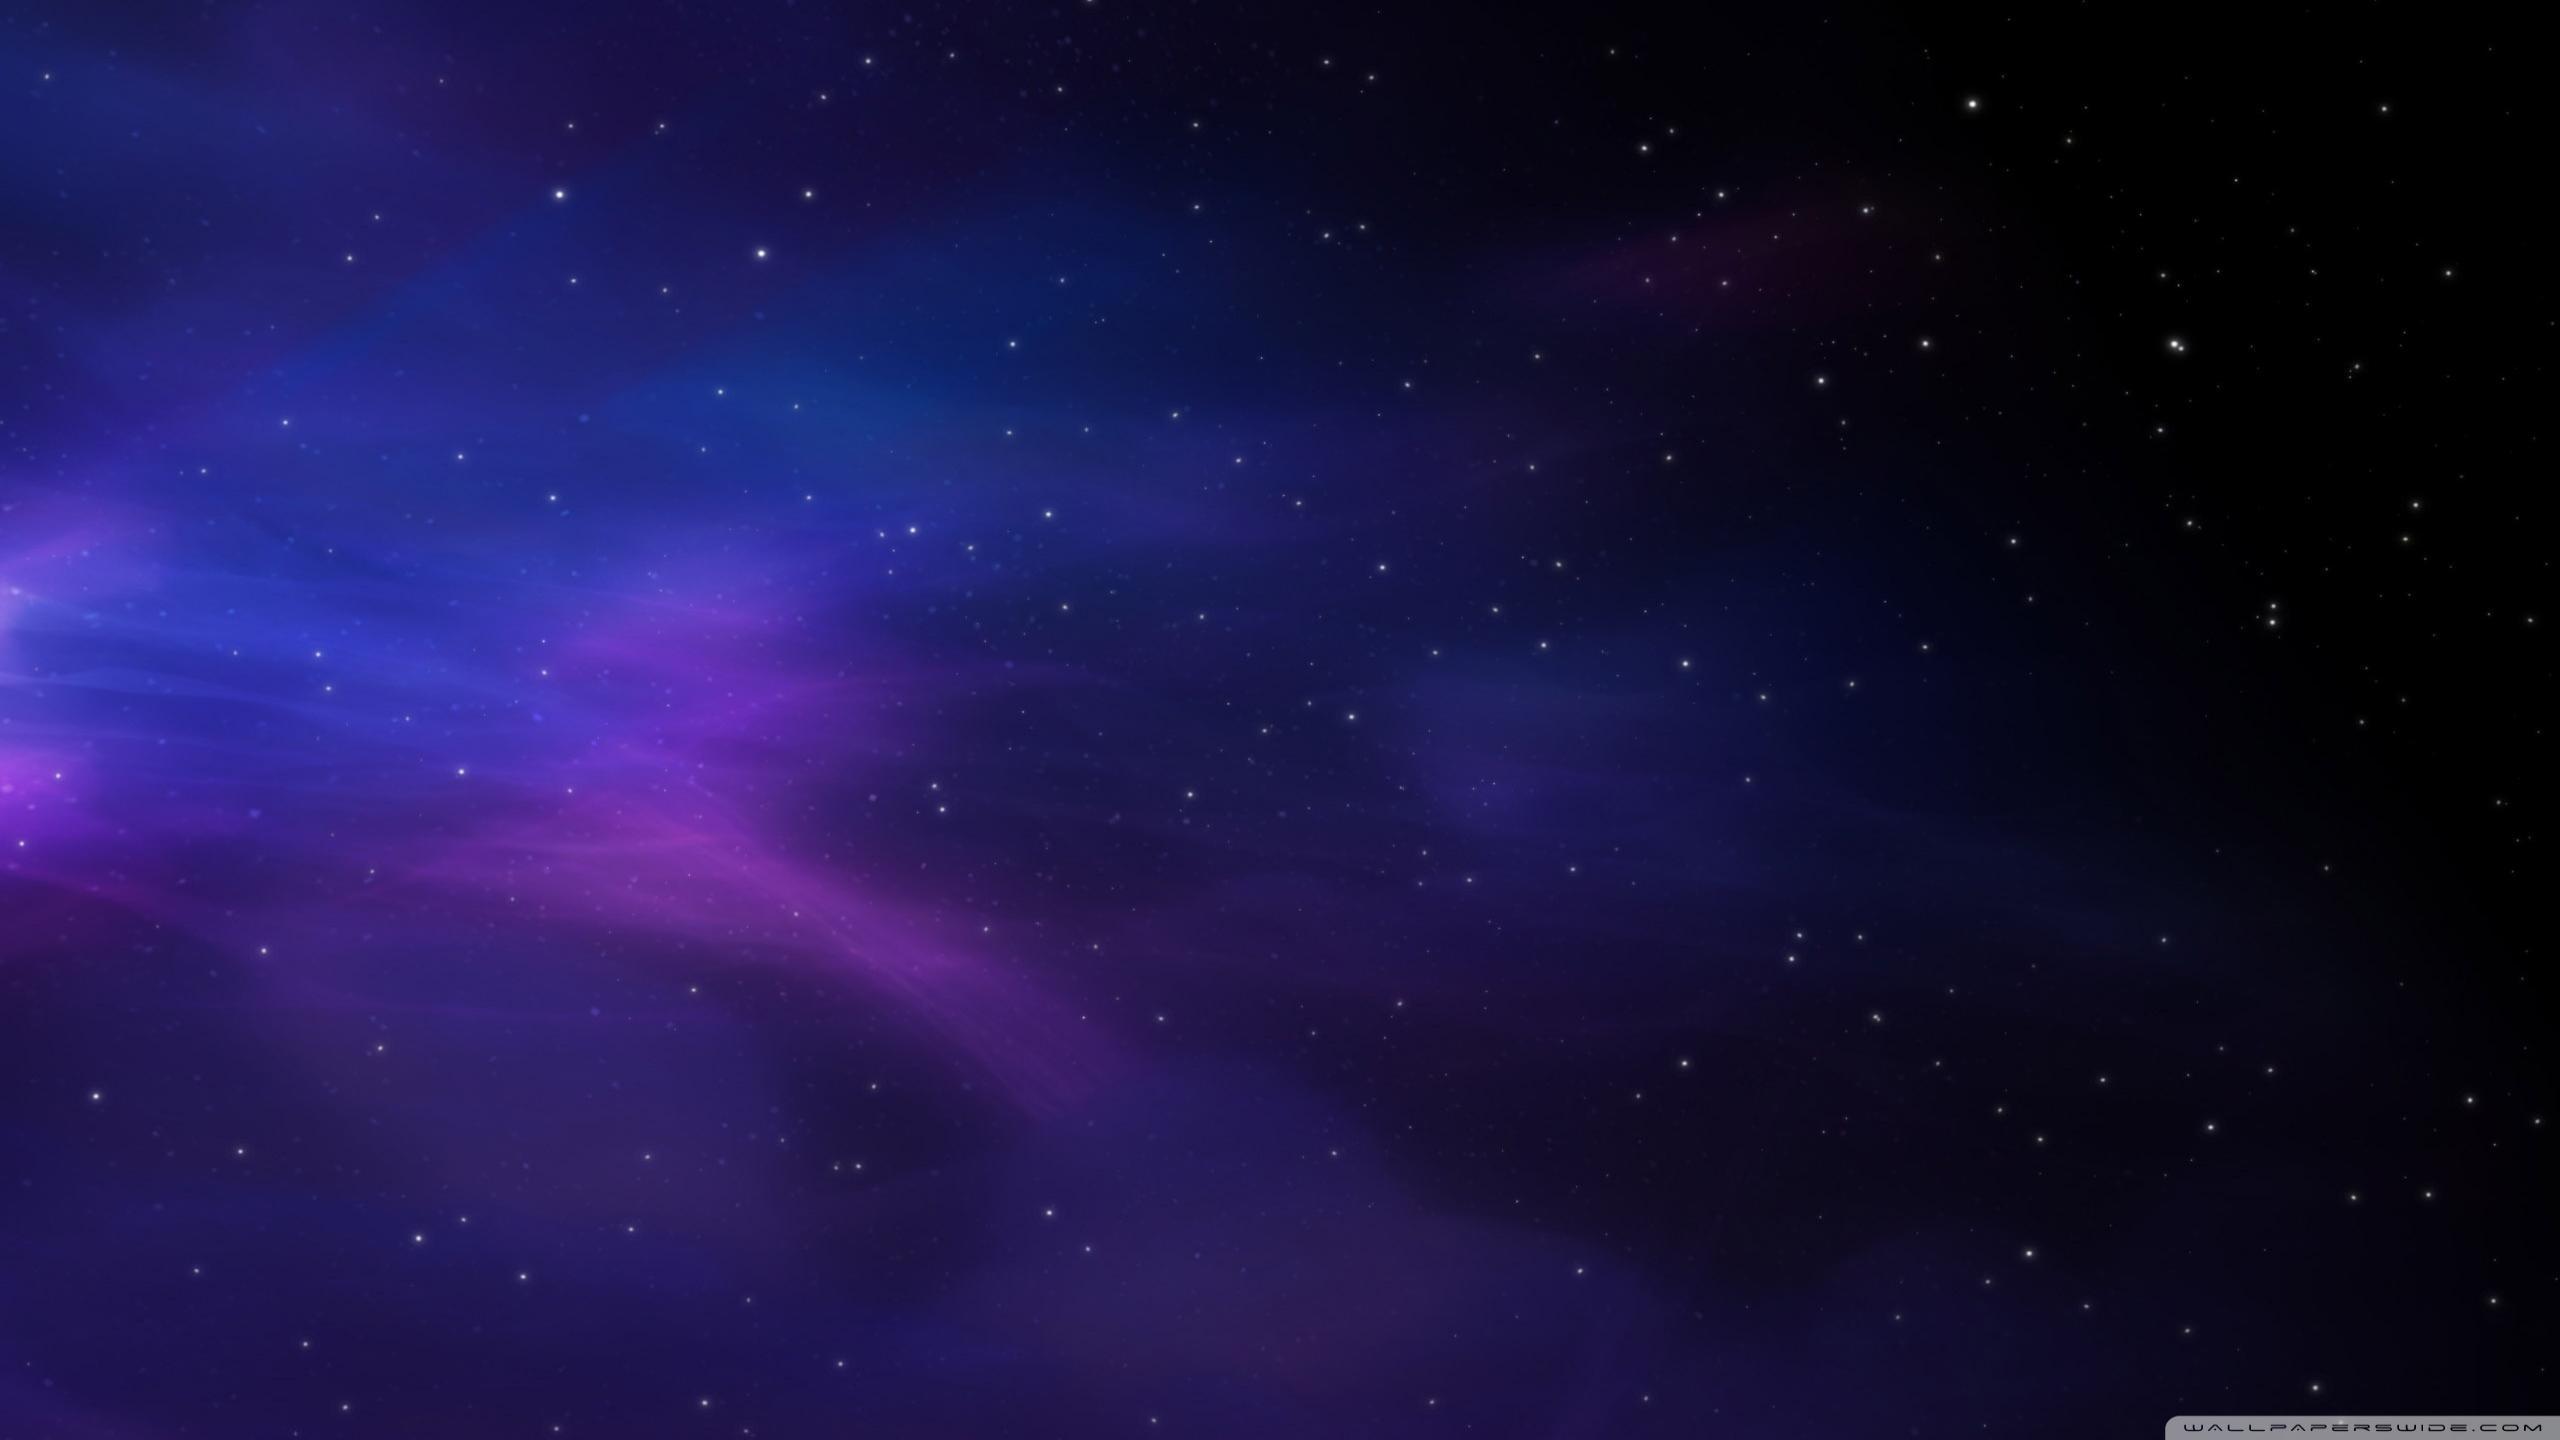 Download Tumblr Galaxy space 2560x1440 HD Wallpaper 2560x1440